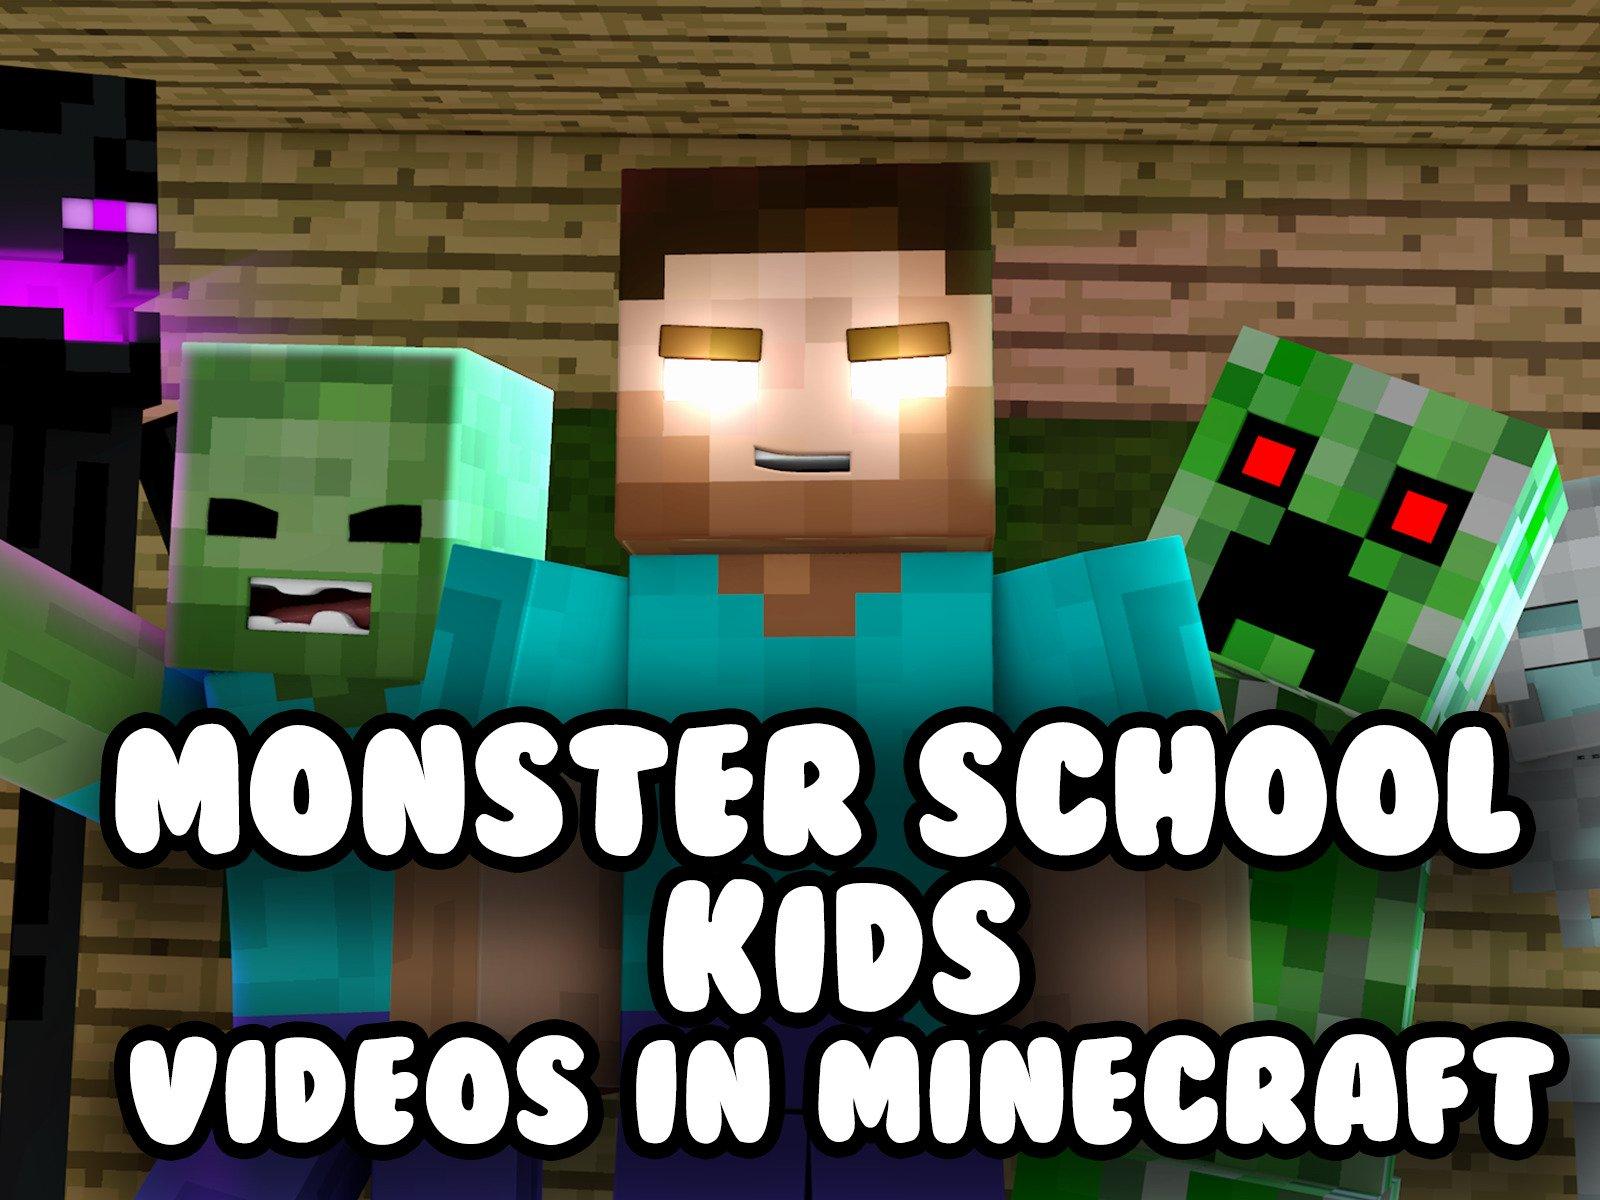 Watch Monster School Kids - Videos in Minecraft  Prime Video